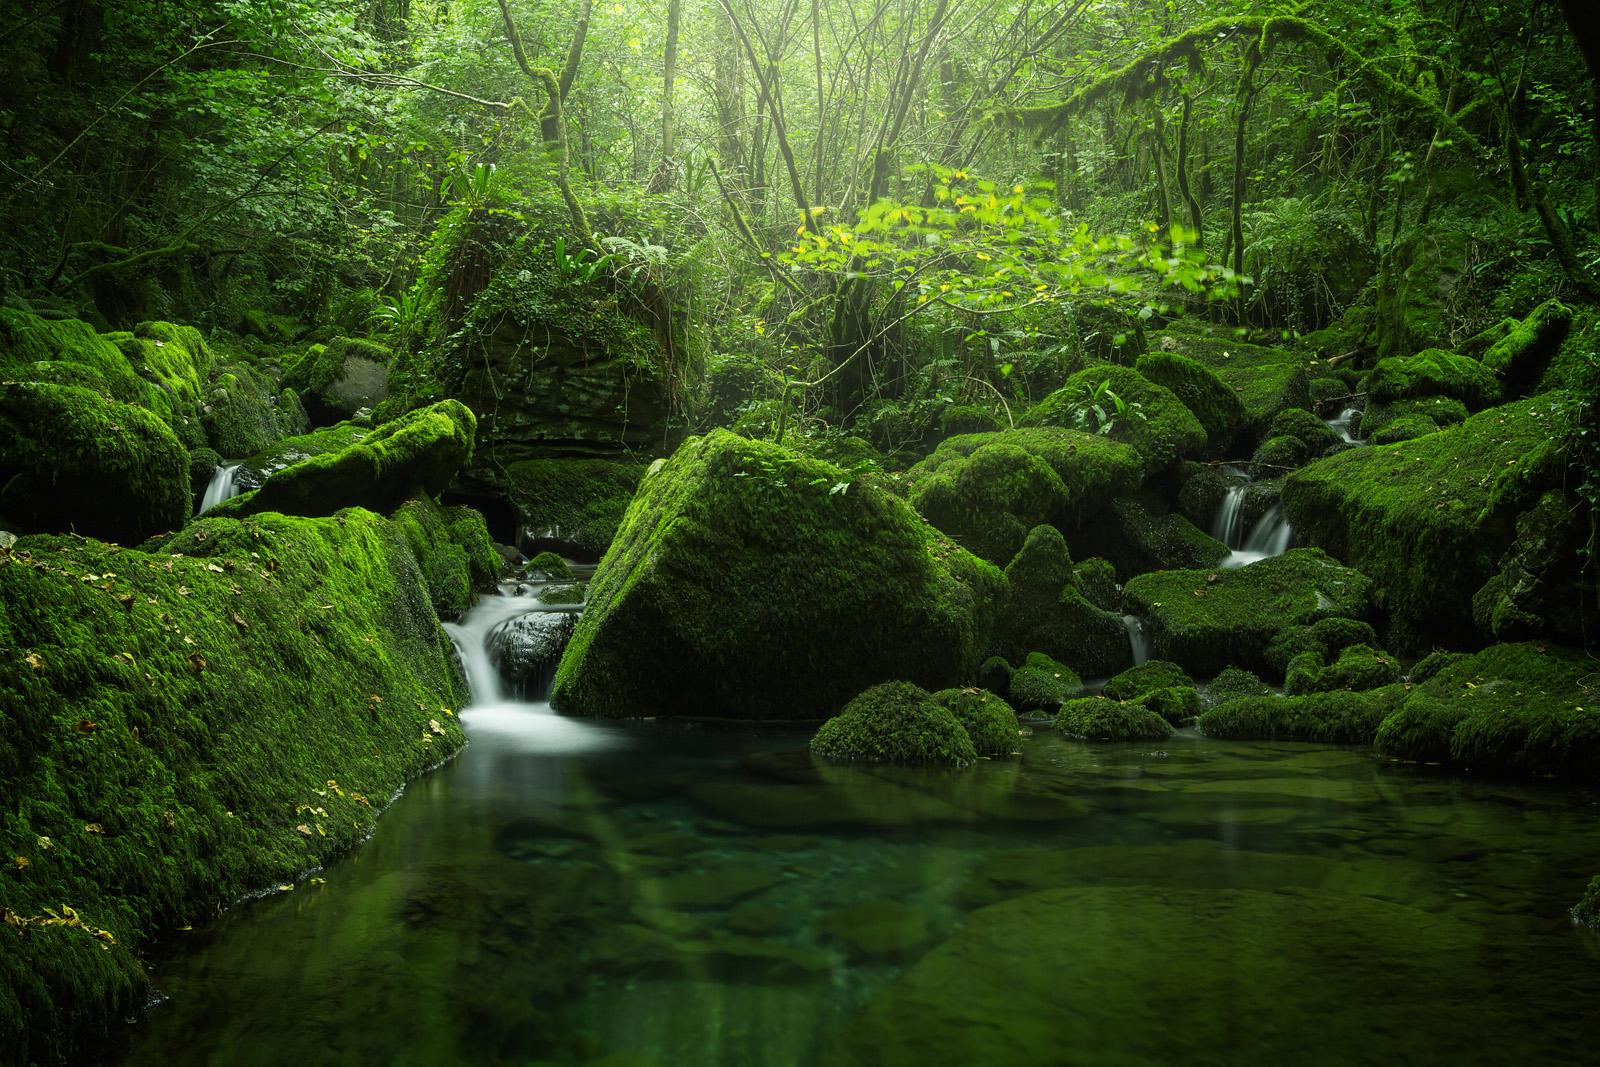 The_Green_Realm_III_1600